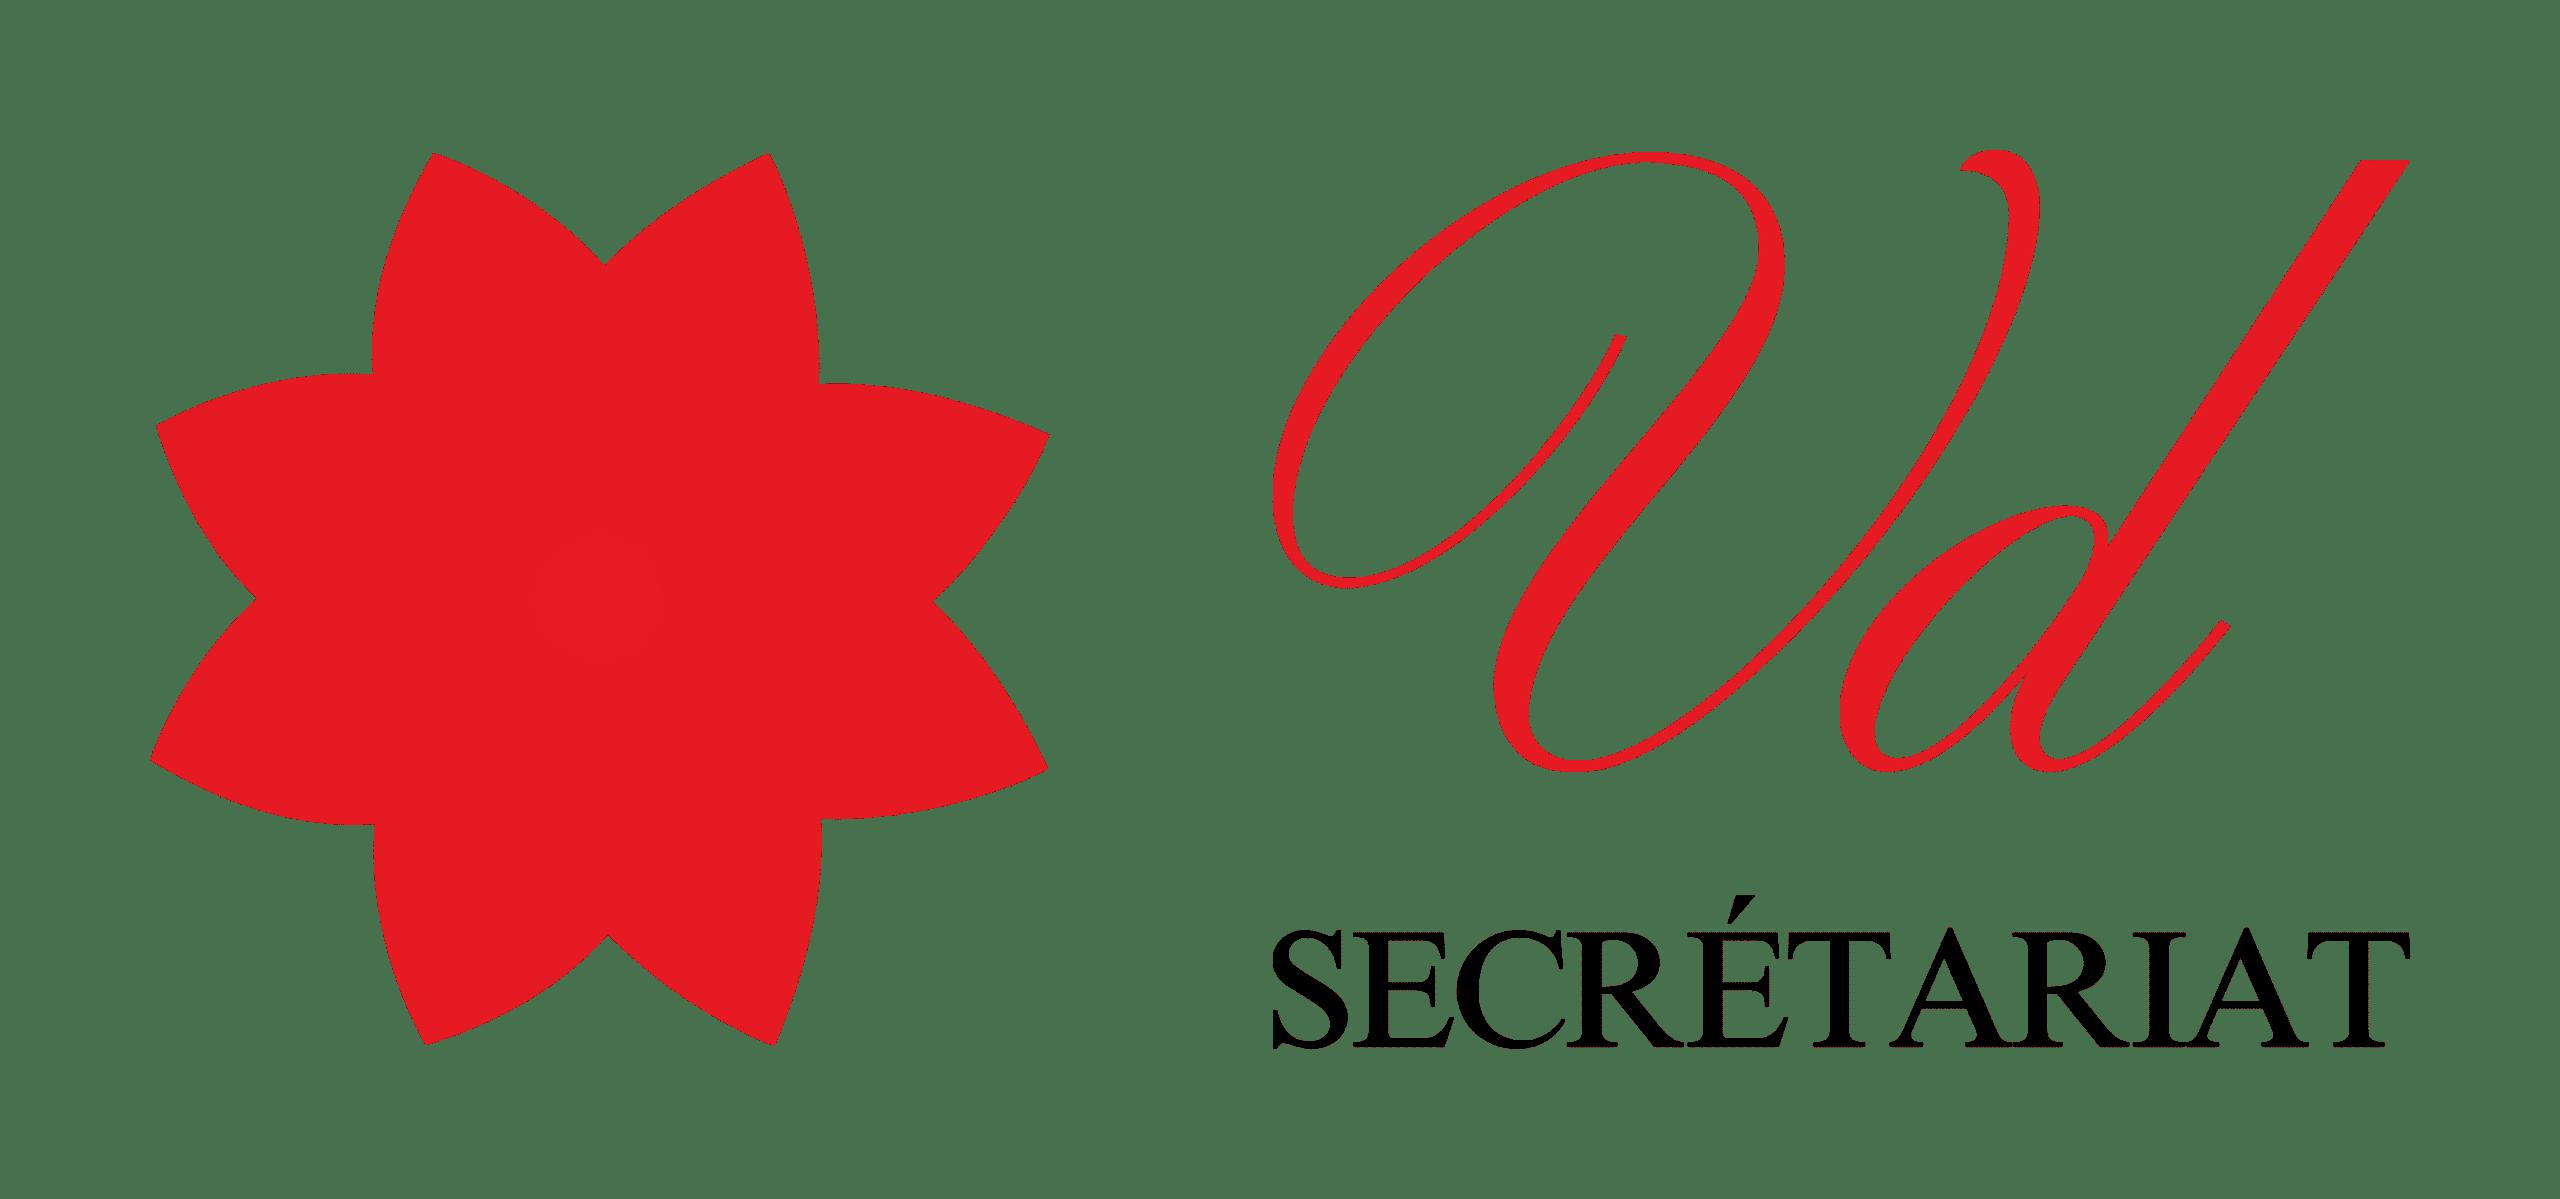 DEVIS logo société vdsecretariat véronique da costa